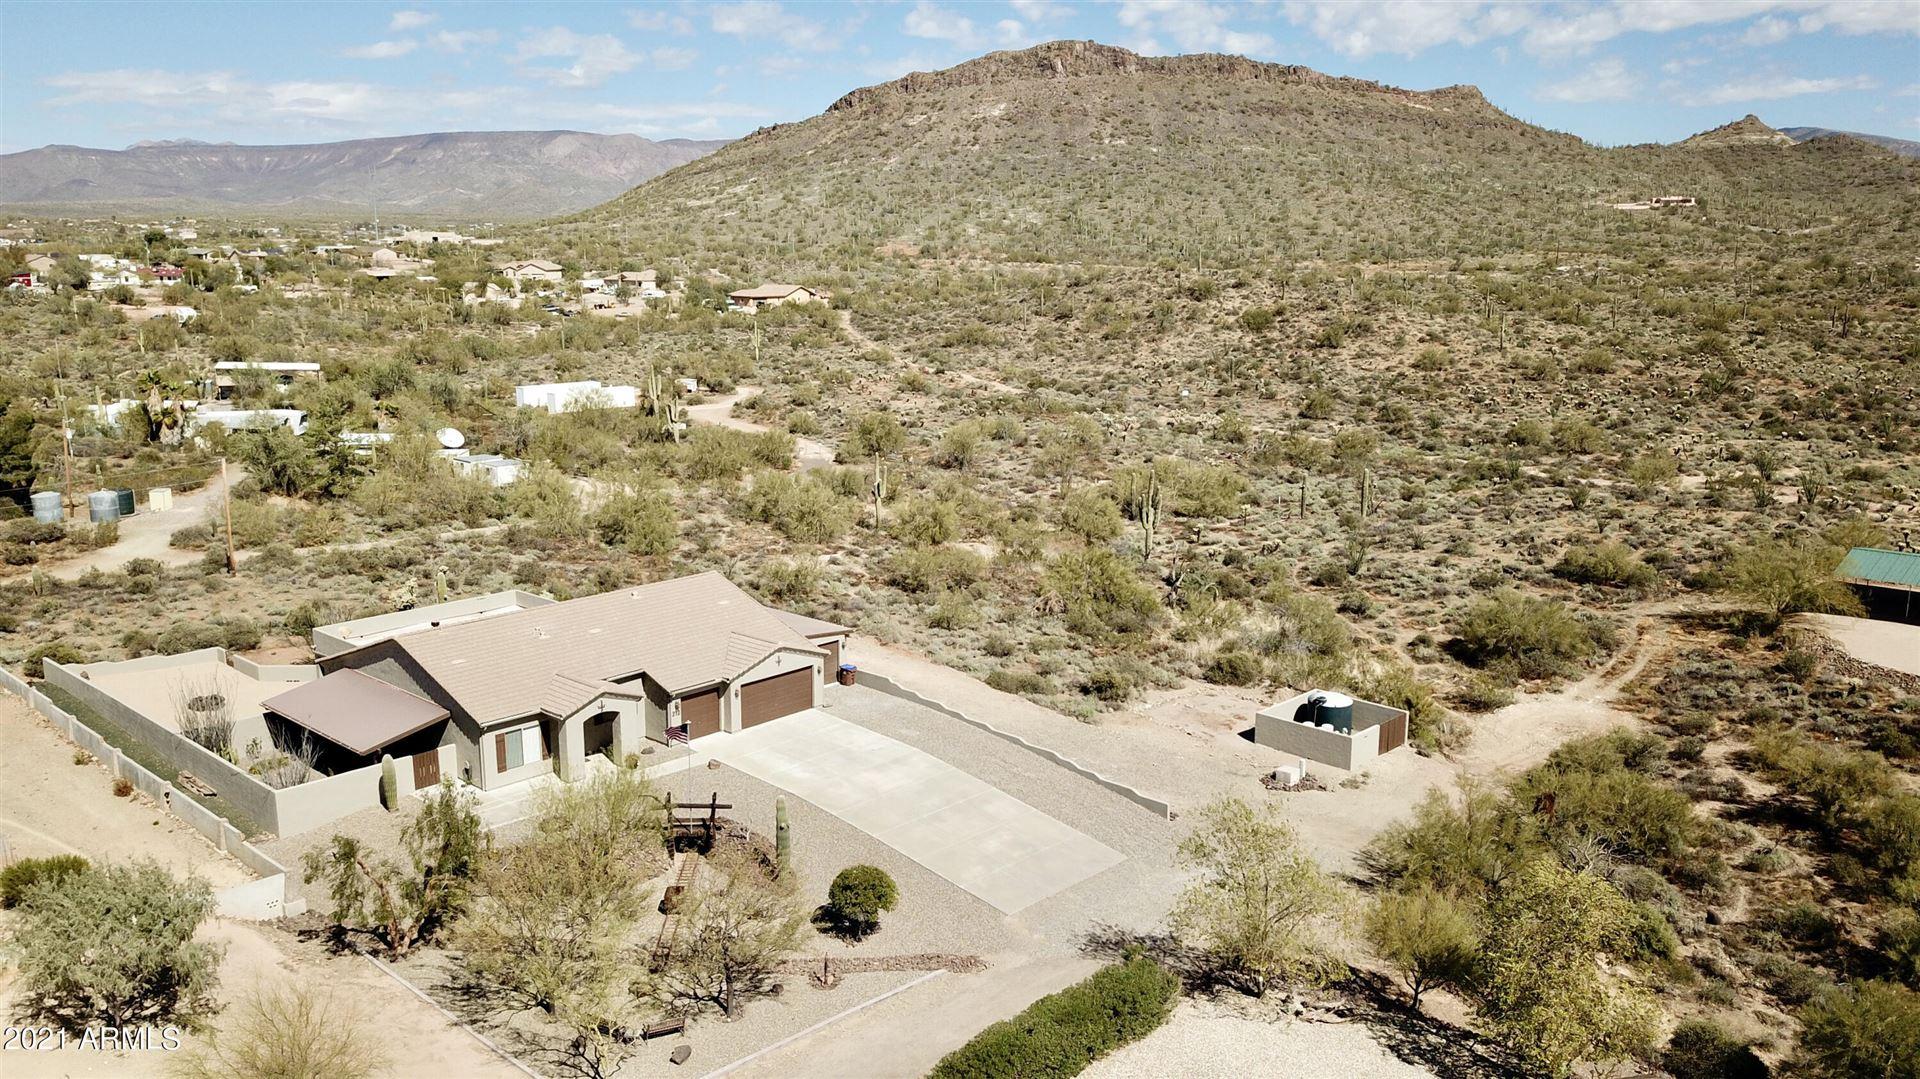 Photo of 212 W BLUE WASH Road, New River, AZ 85087 (MLS # 6202401)